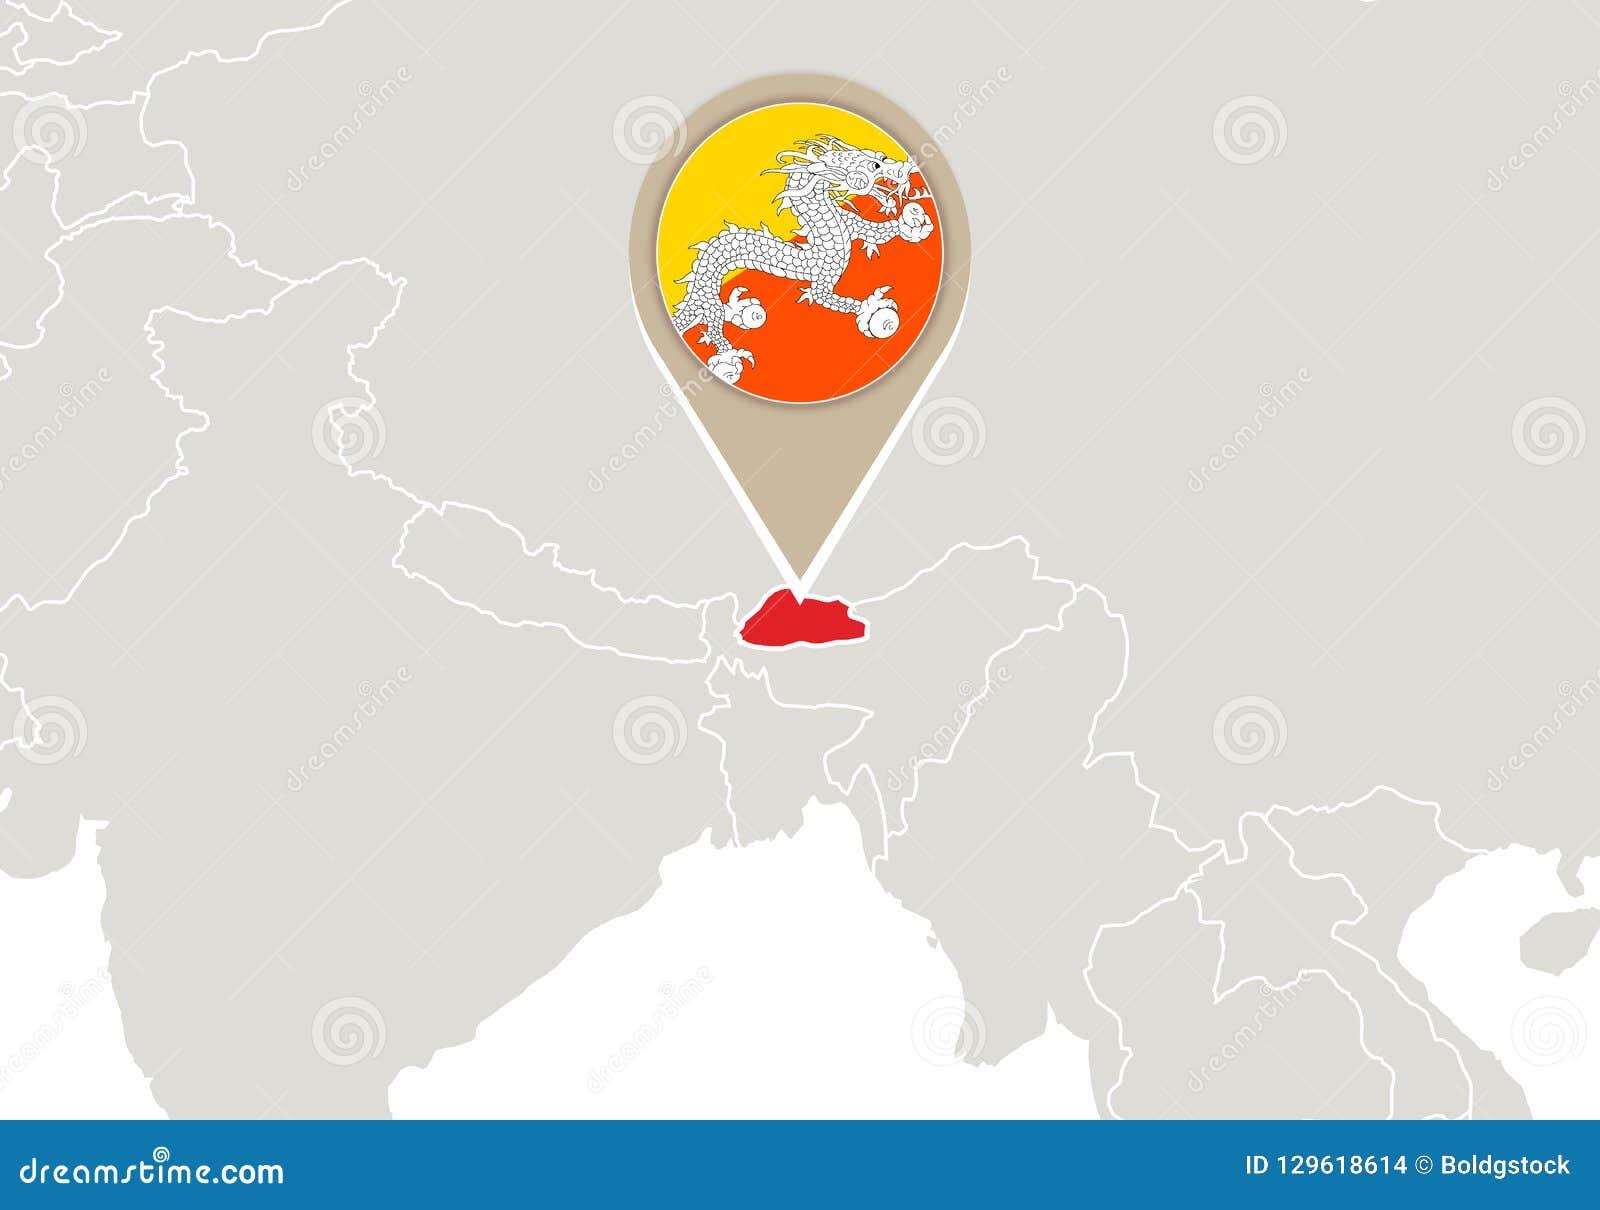 World Map Bhutan.Bhutan On World Map Stock Vector Illustration Of Direction 129618614